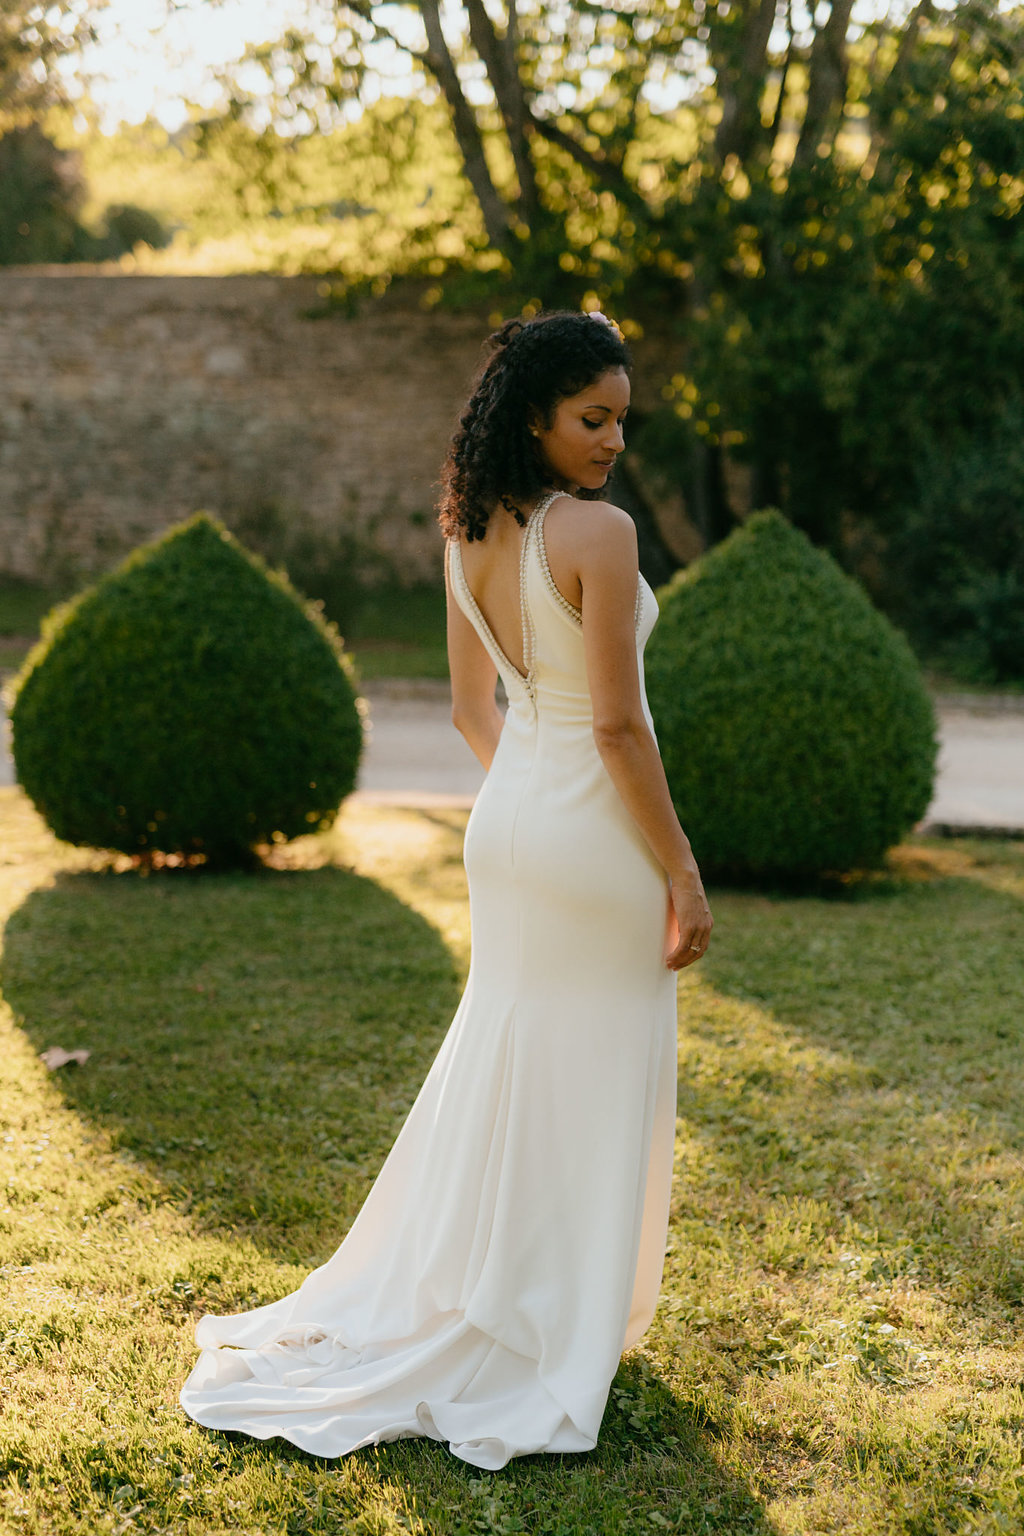 meilleur wedding planner lyon